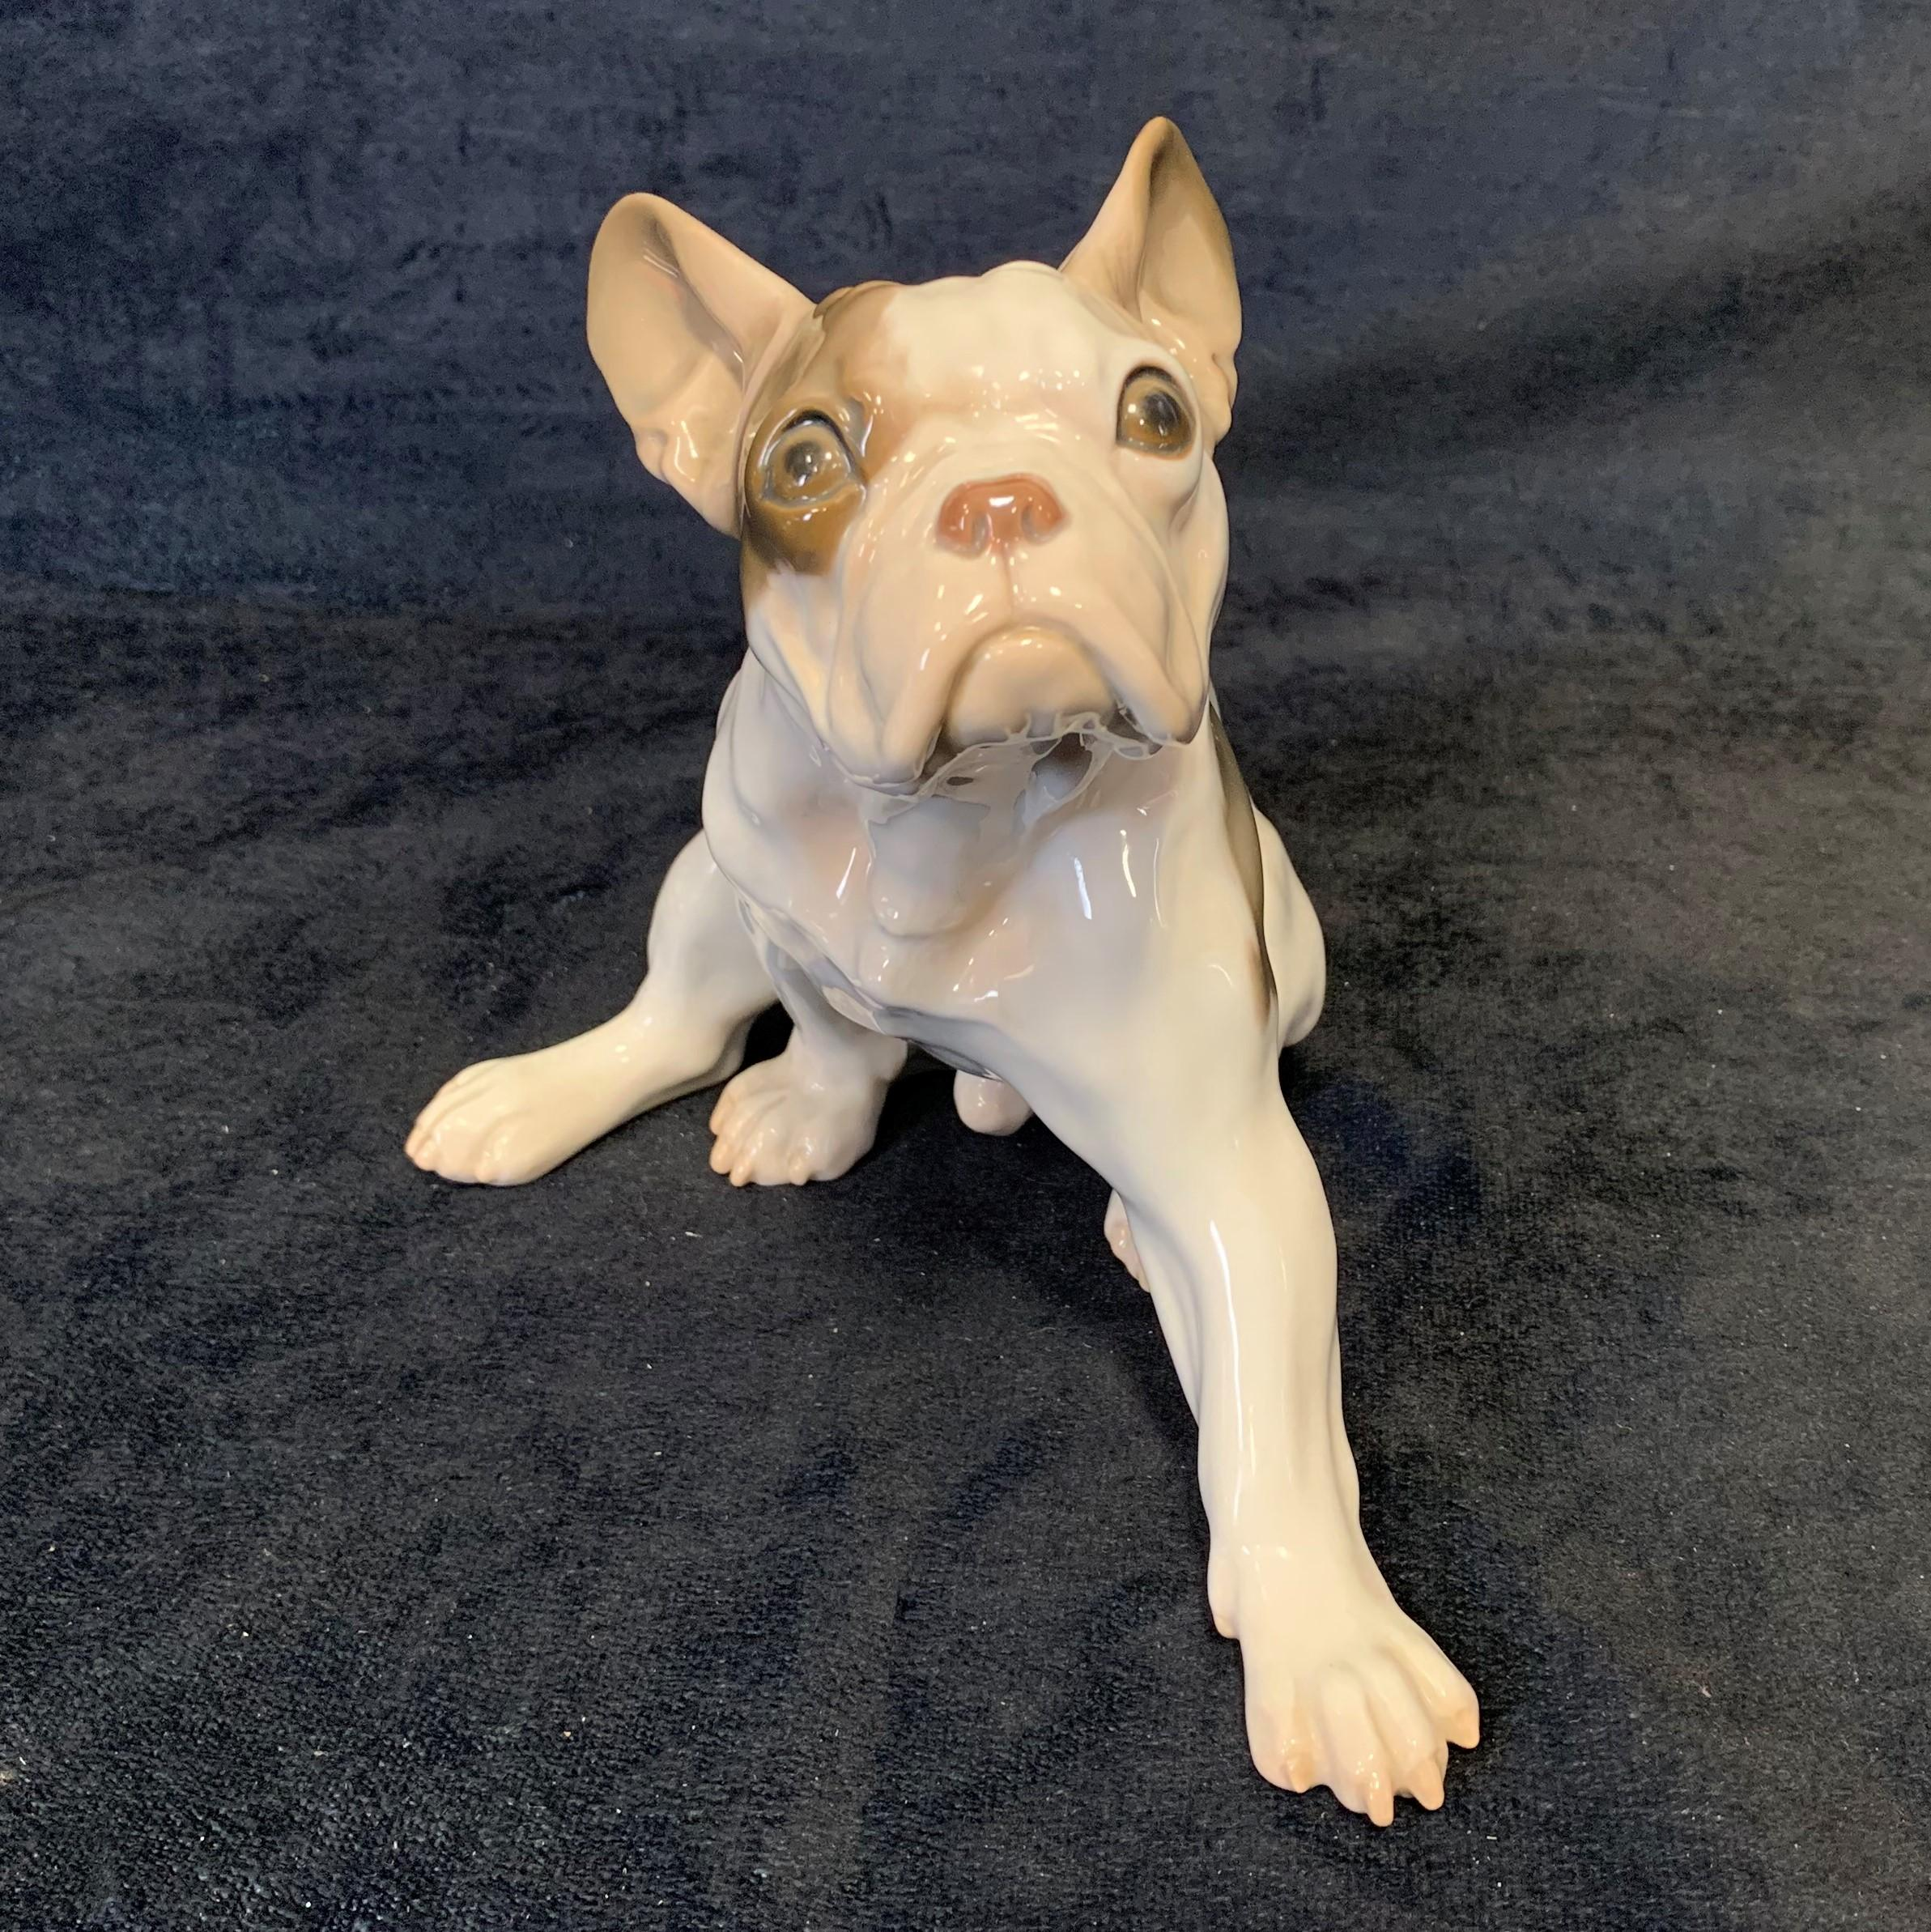 Bing & Grondahl Porcelain French Bulldog Figurine